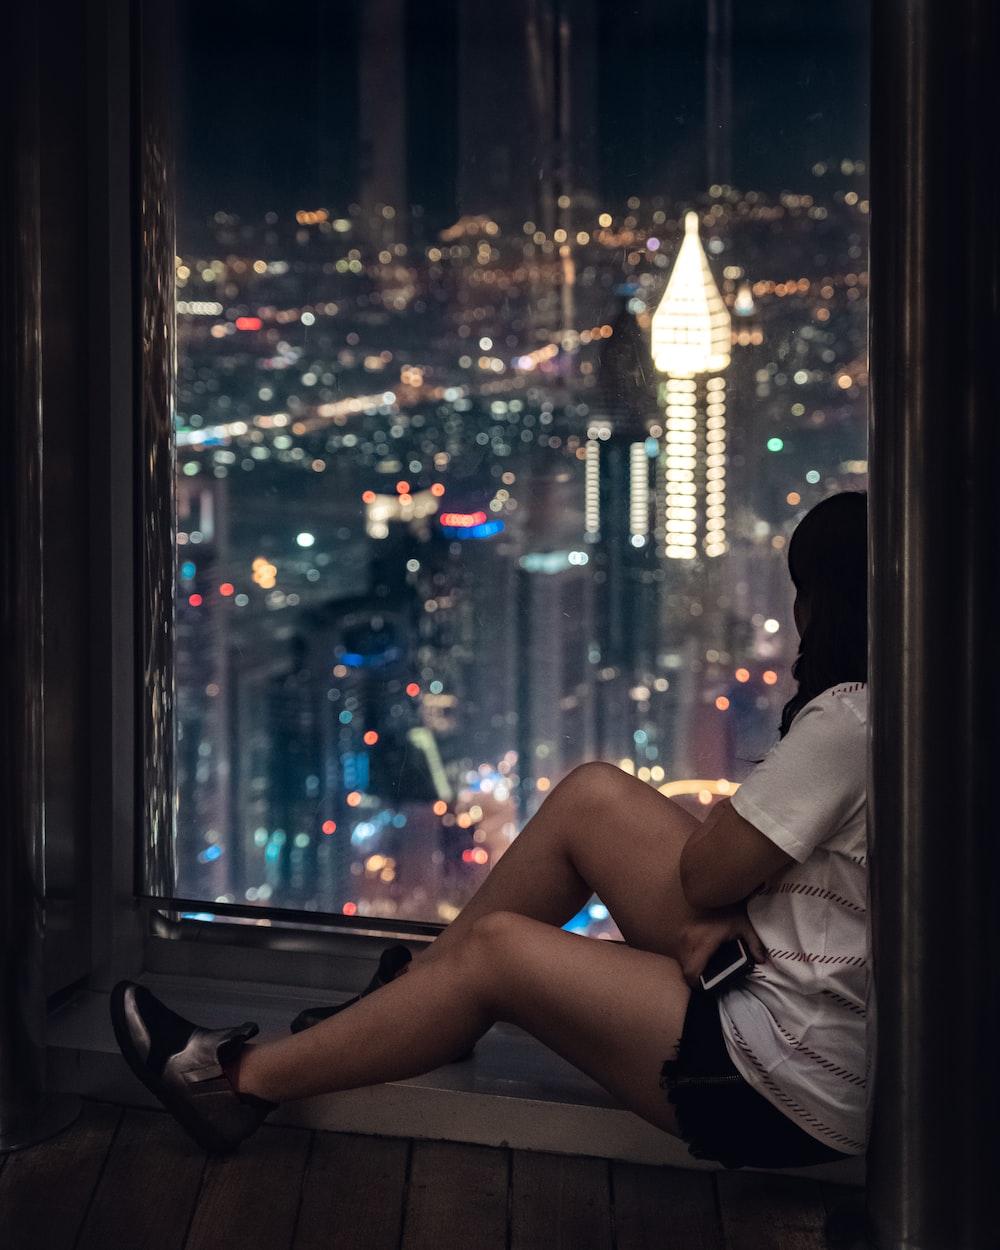 woman sitting beside window during nighttime